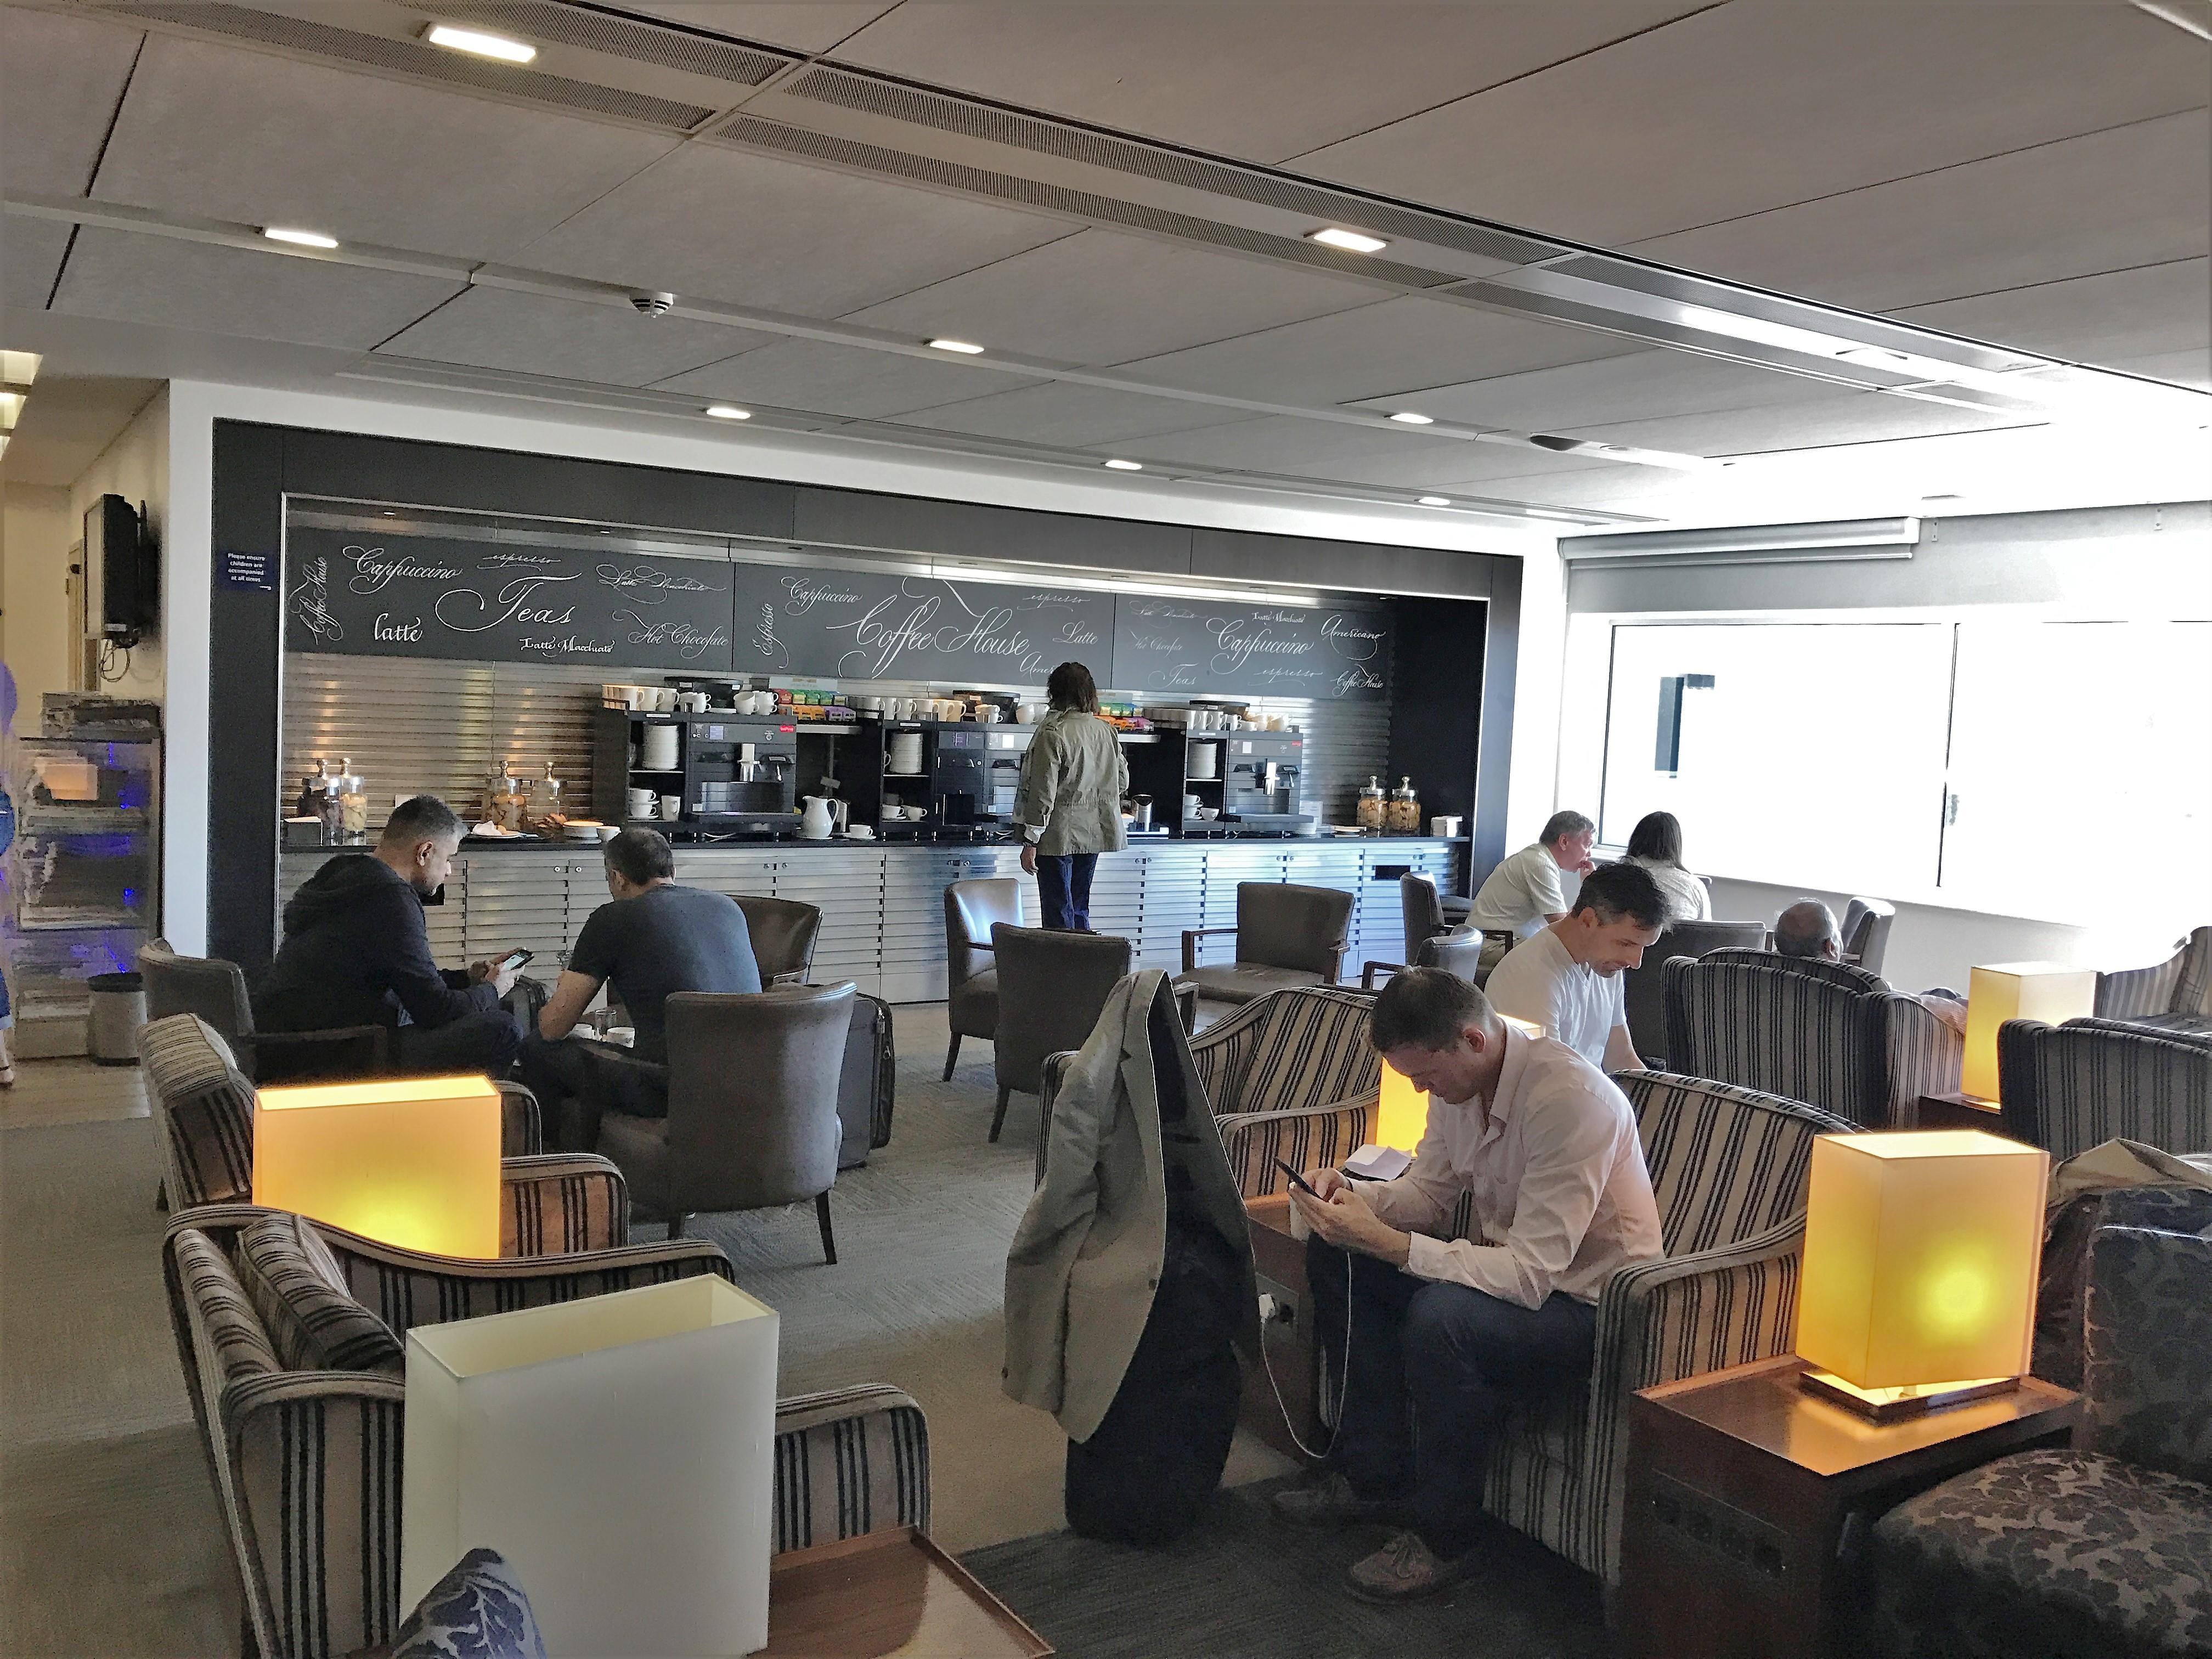 Ba Lounge Terminal 3 >> British Airways Galleries Club First Lounges T3 Heathrow